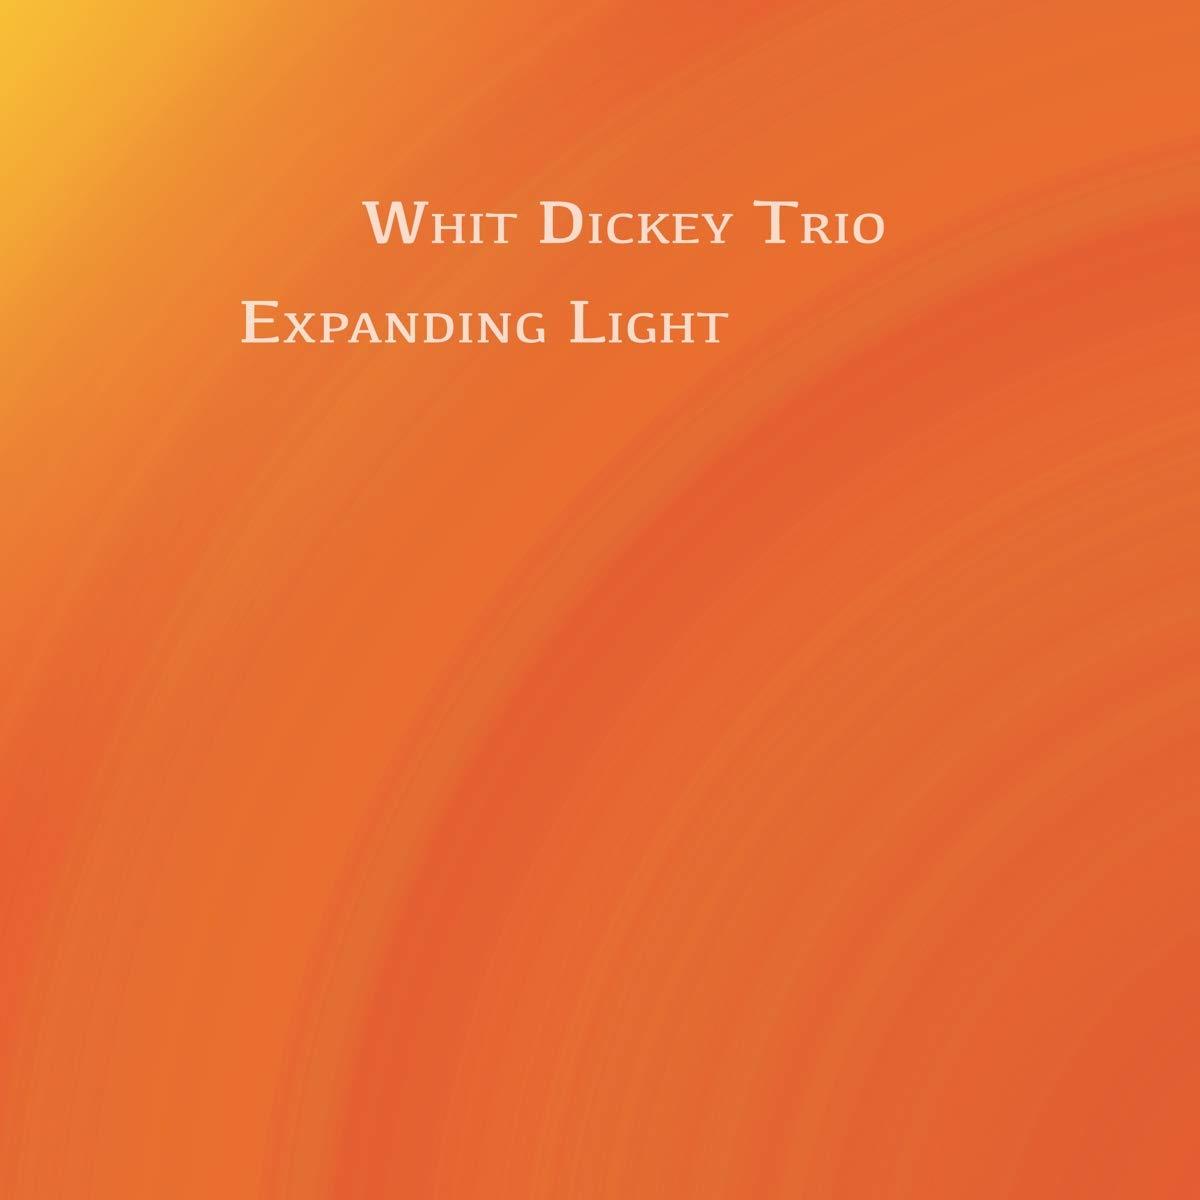 Whit Dickey Trio - Expanding Light - Amazon.com Music